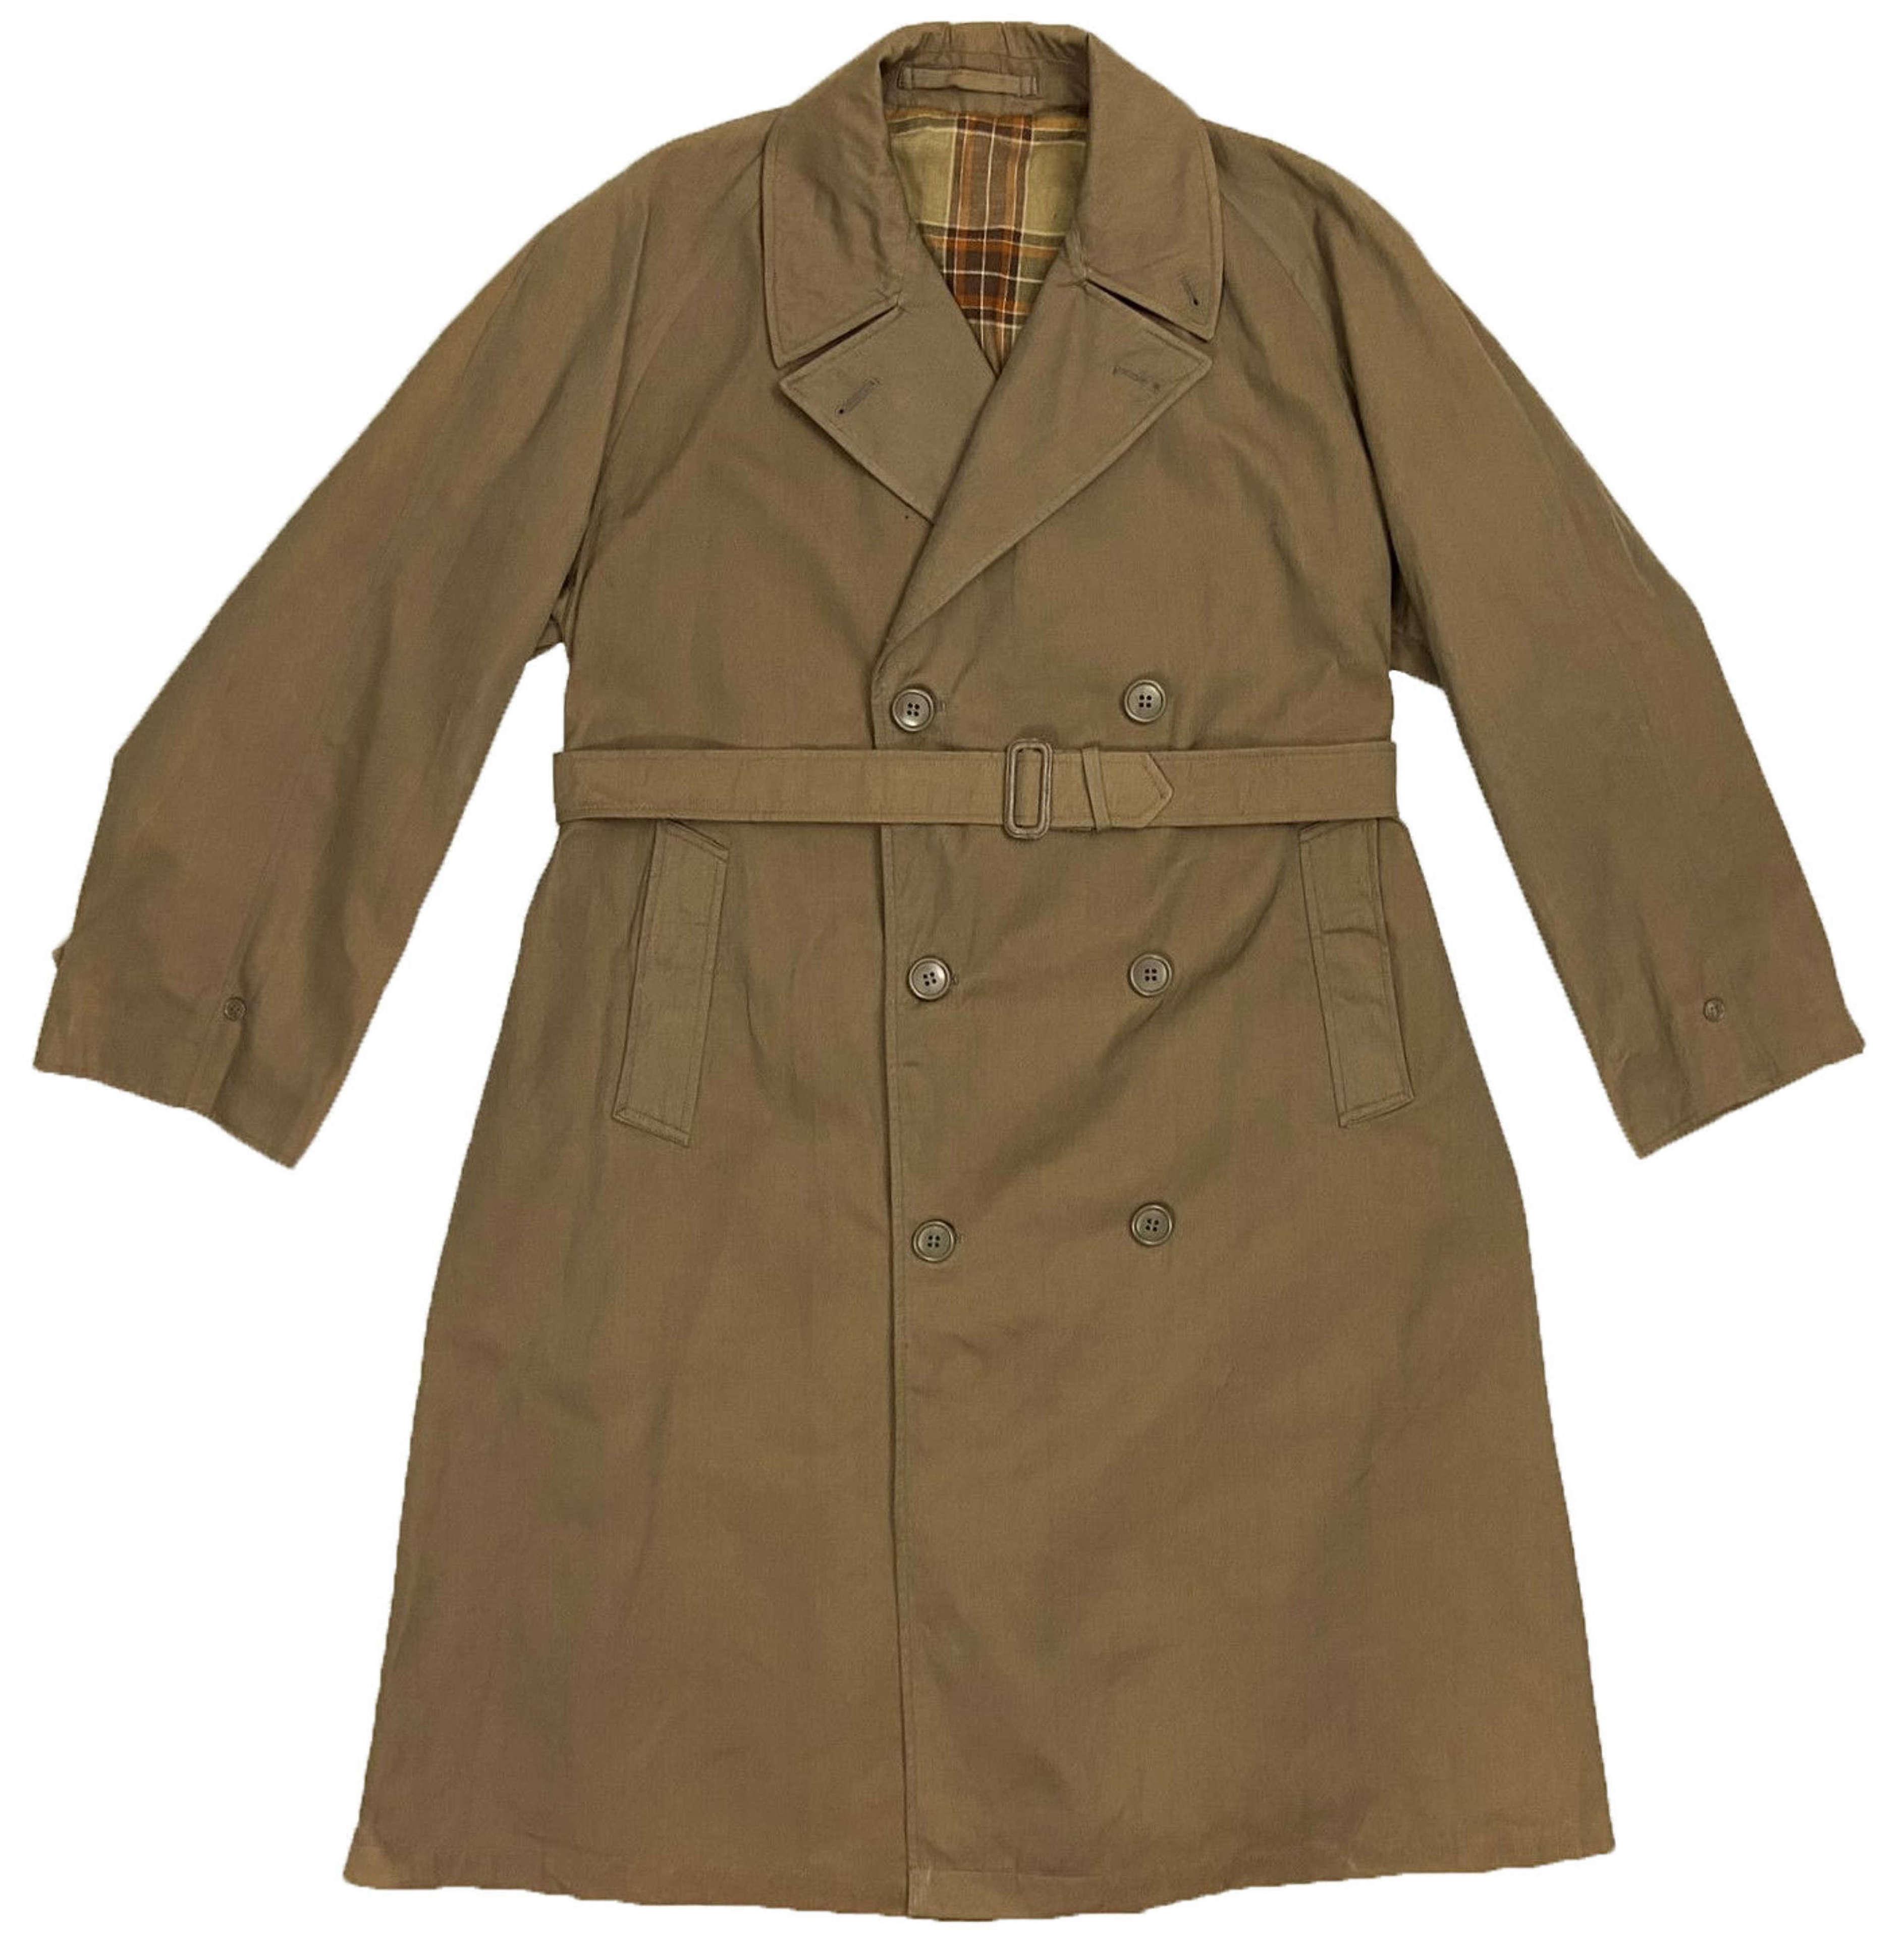 Original 1956 Dated Demobilised Servicemen's Double Breasted Raincoat